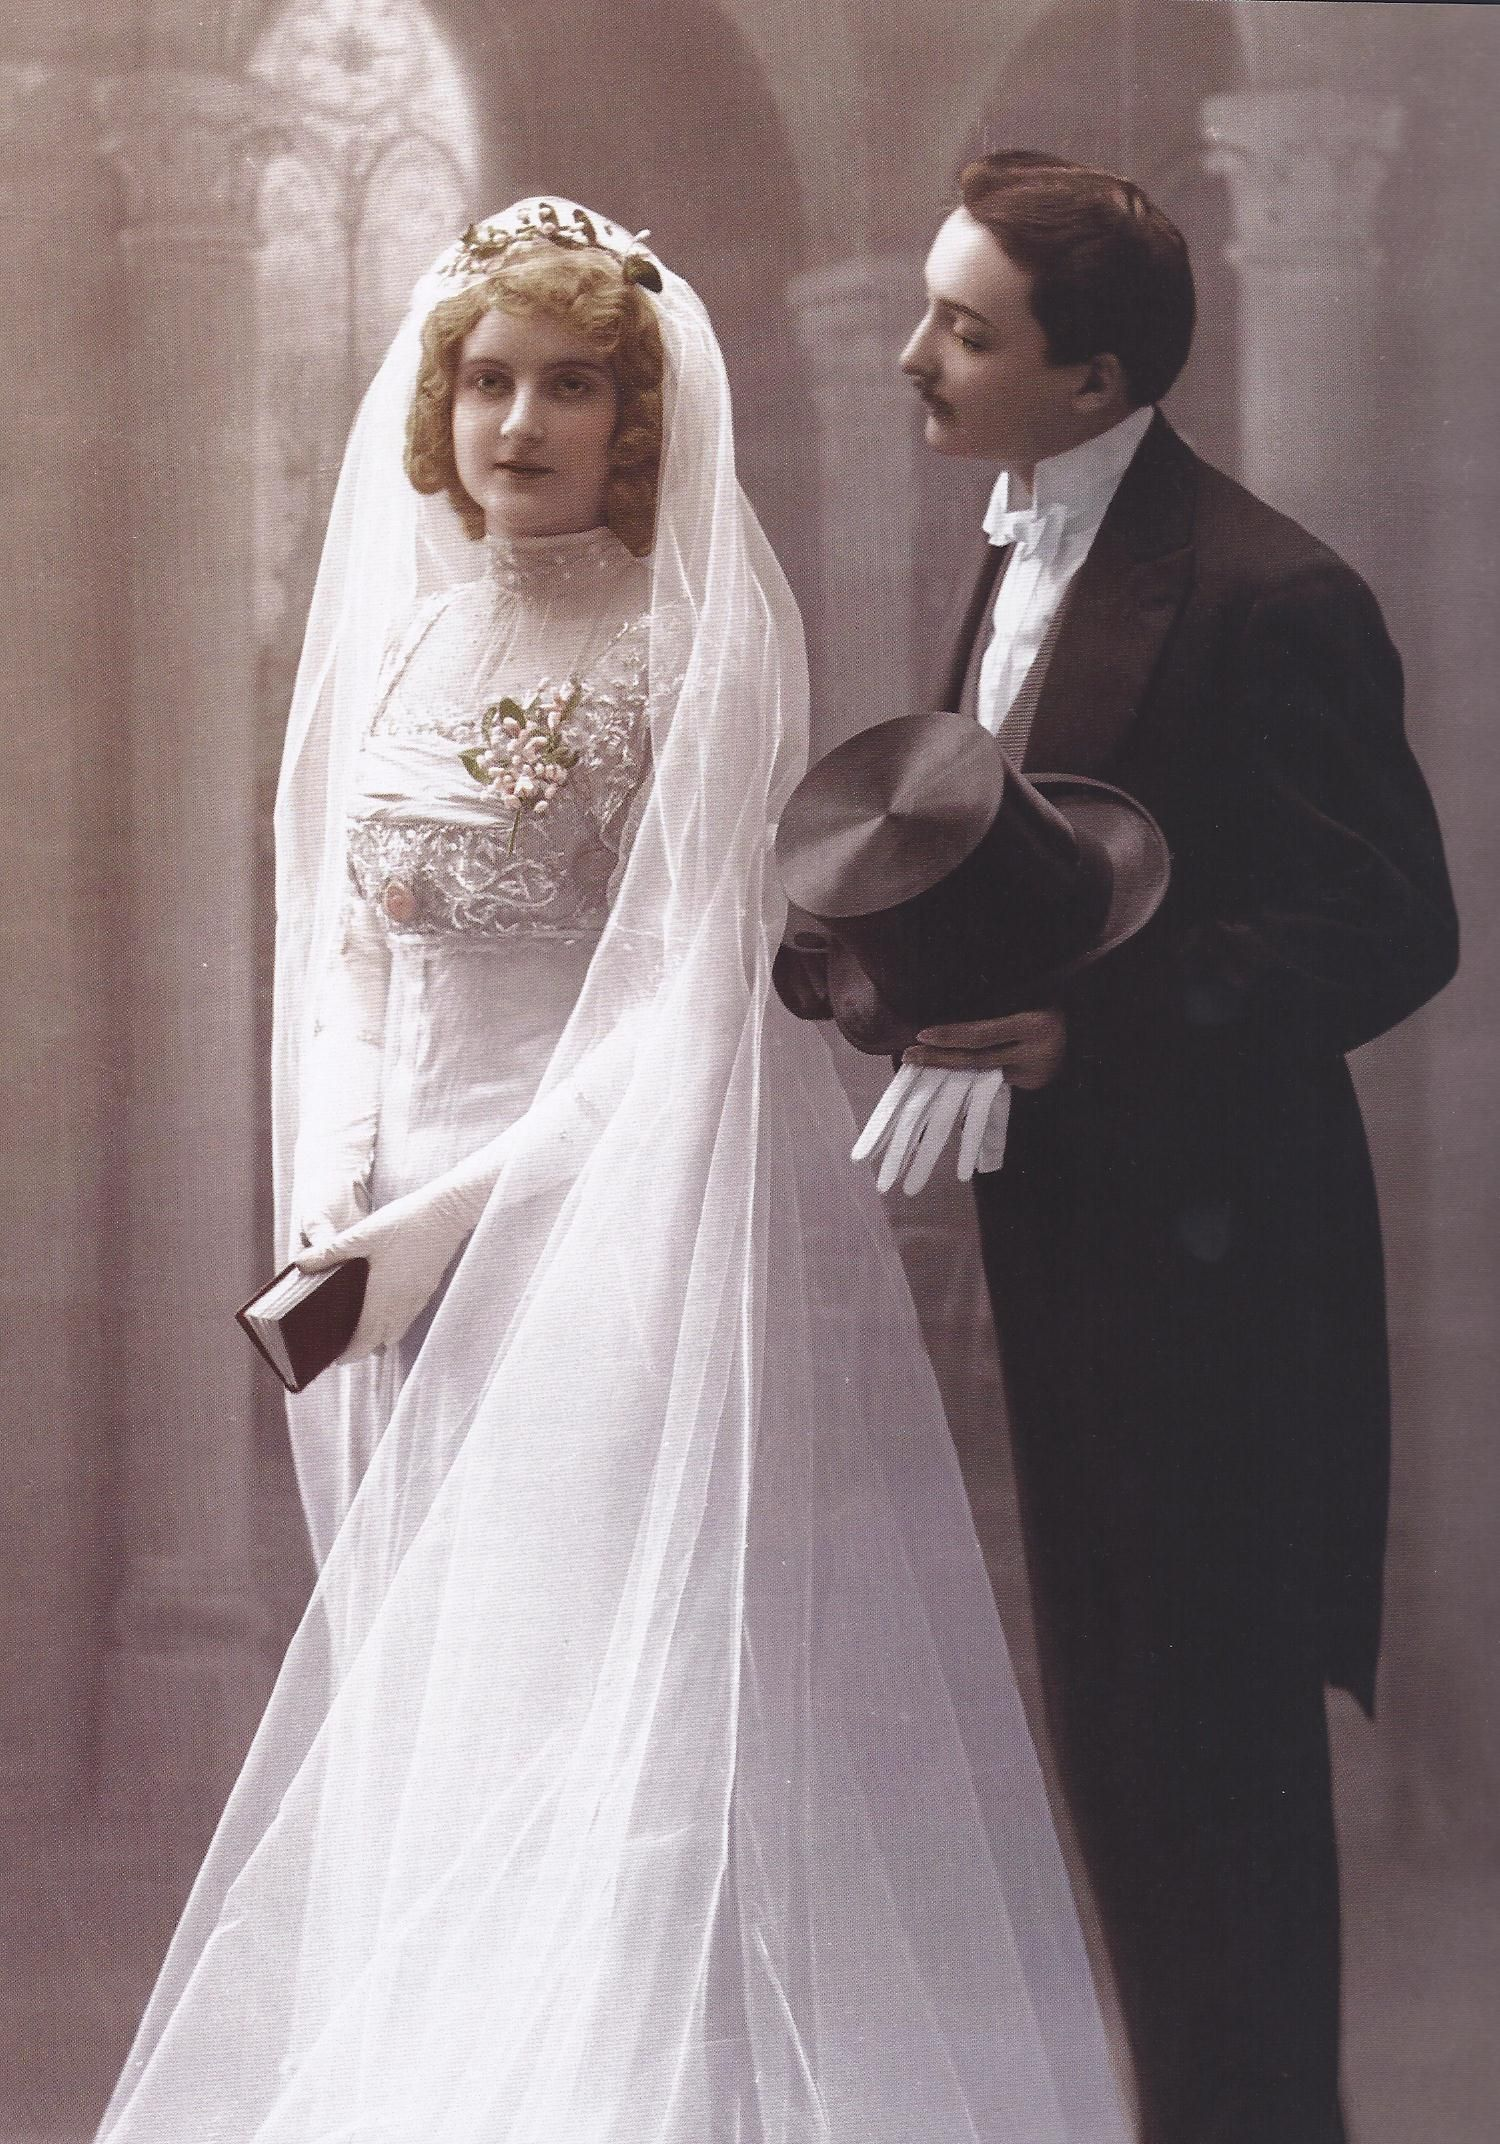 1910 Wedding Portrait Found In Vintage Weddings By Marnie Fogg Antique Wedding Dresses Vintage Bride Wedding Gowns Vintage